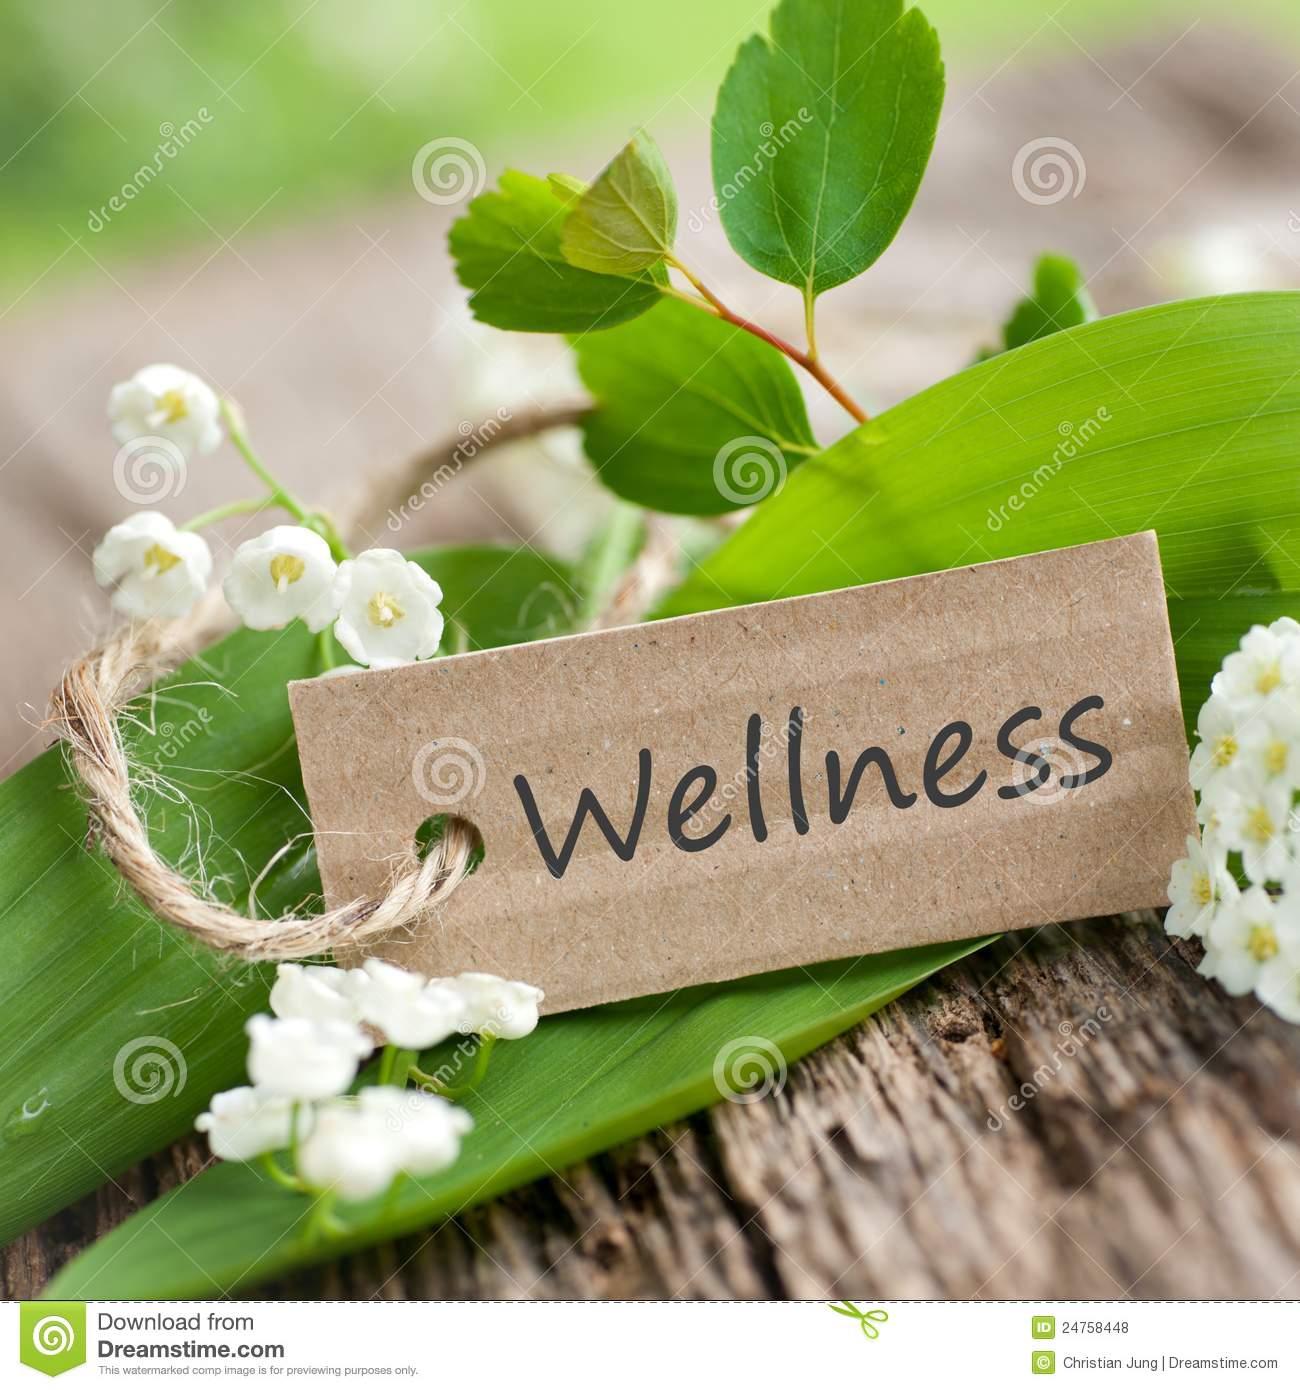 Awesome Wellness Image